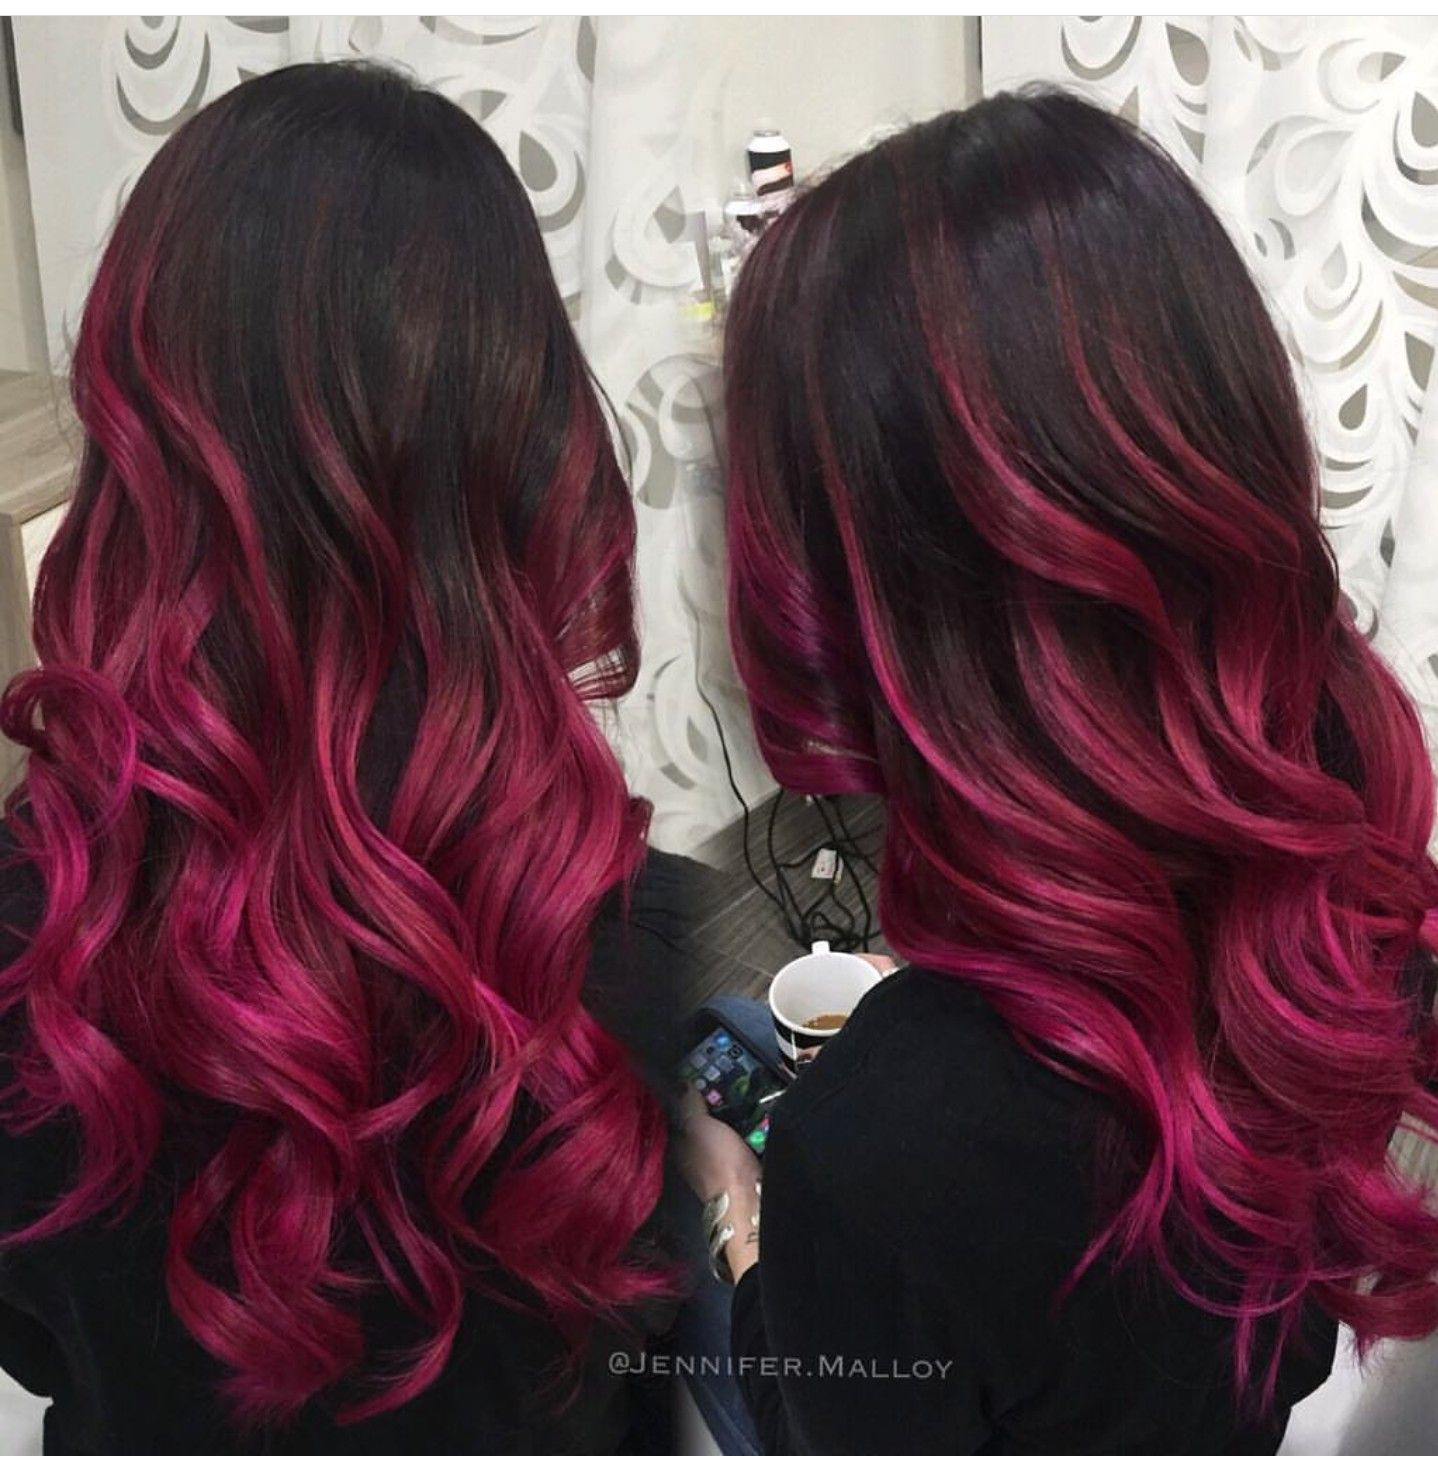 Cool Hair Black Hairstyles Hair Colors Hair